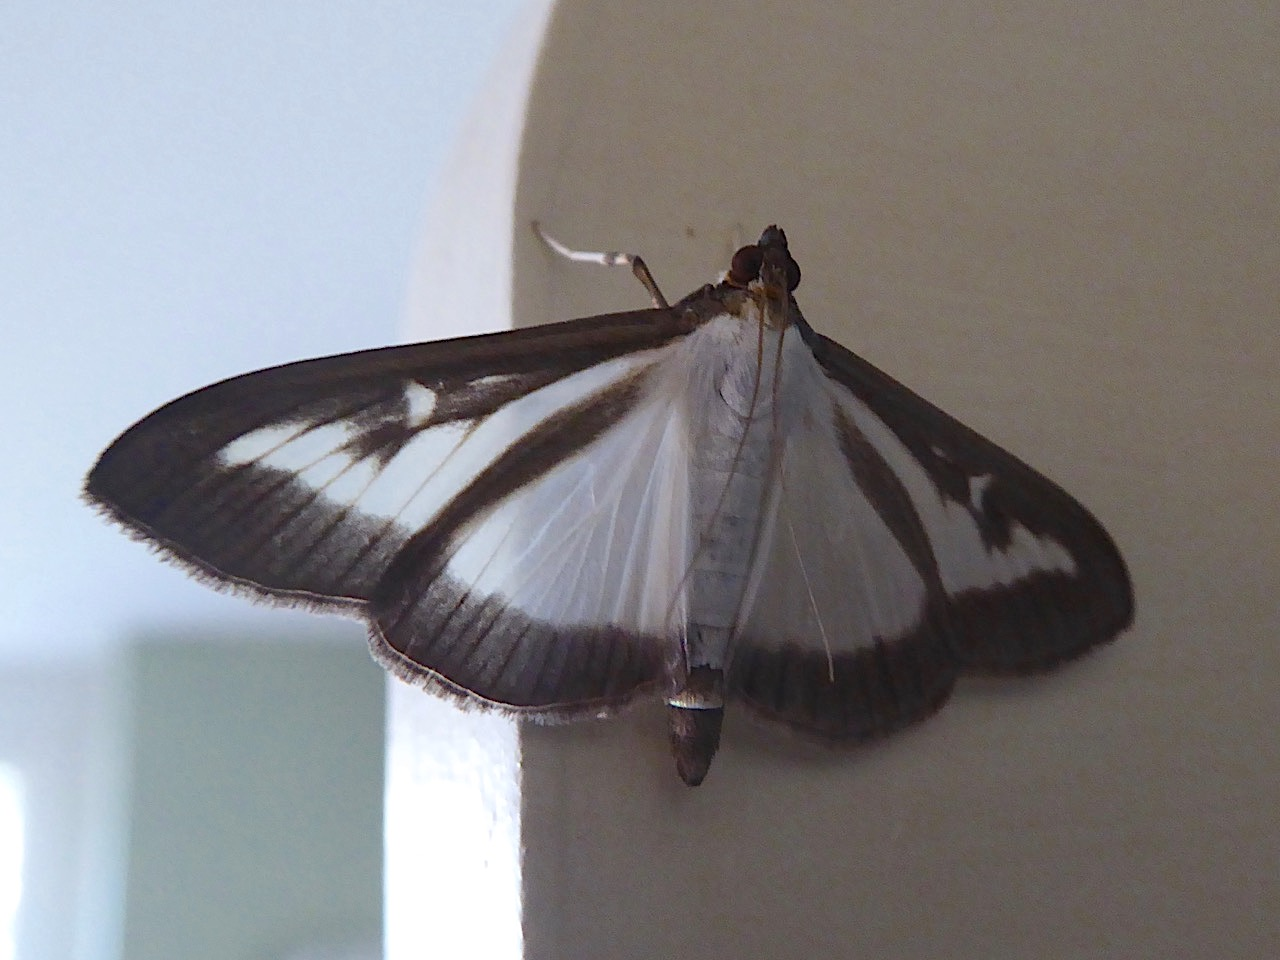 Box-tree Moth, UK (Keith Salvesen)